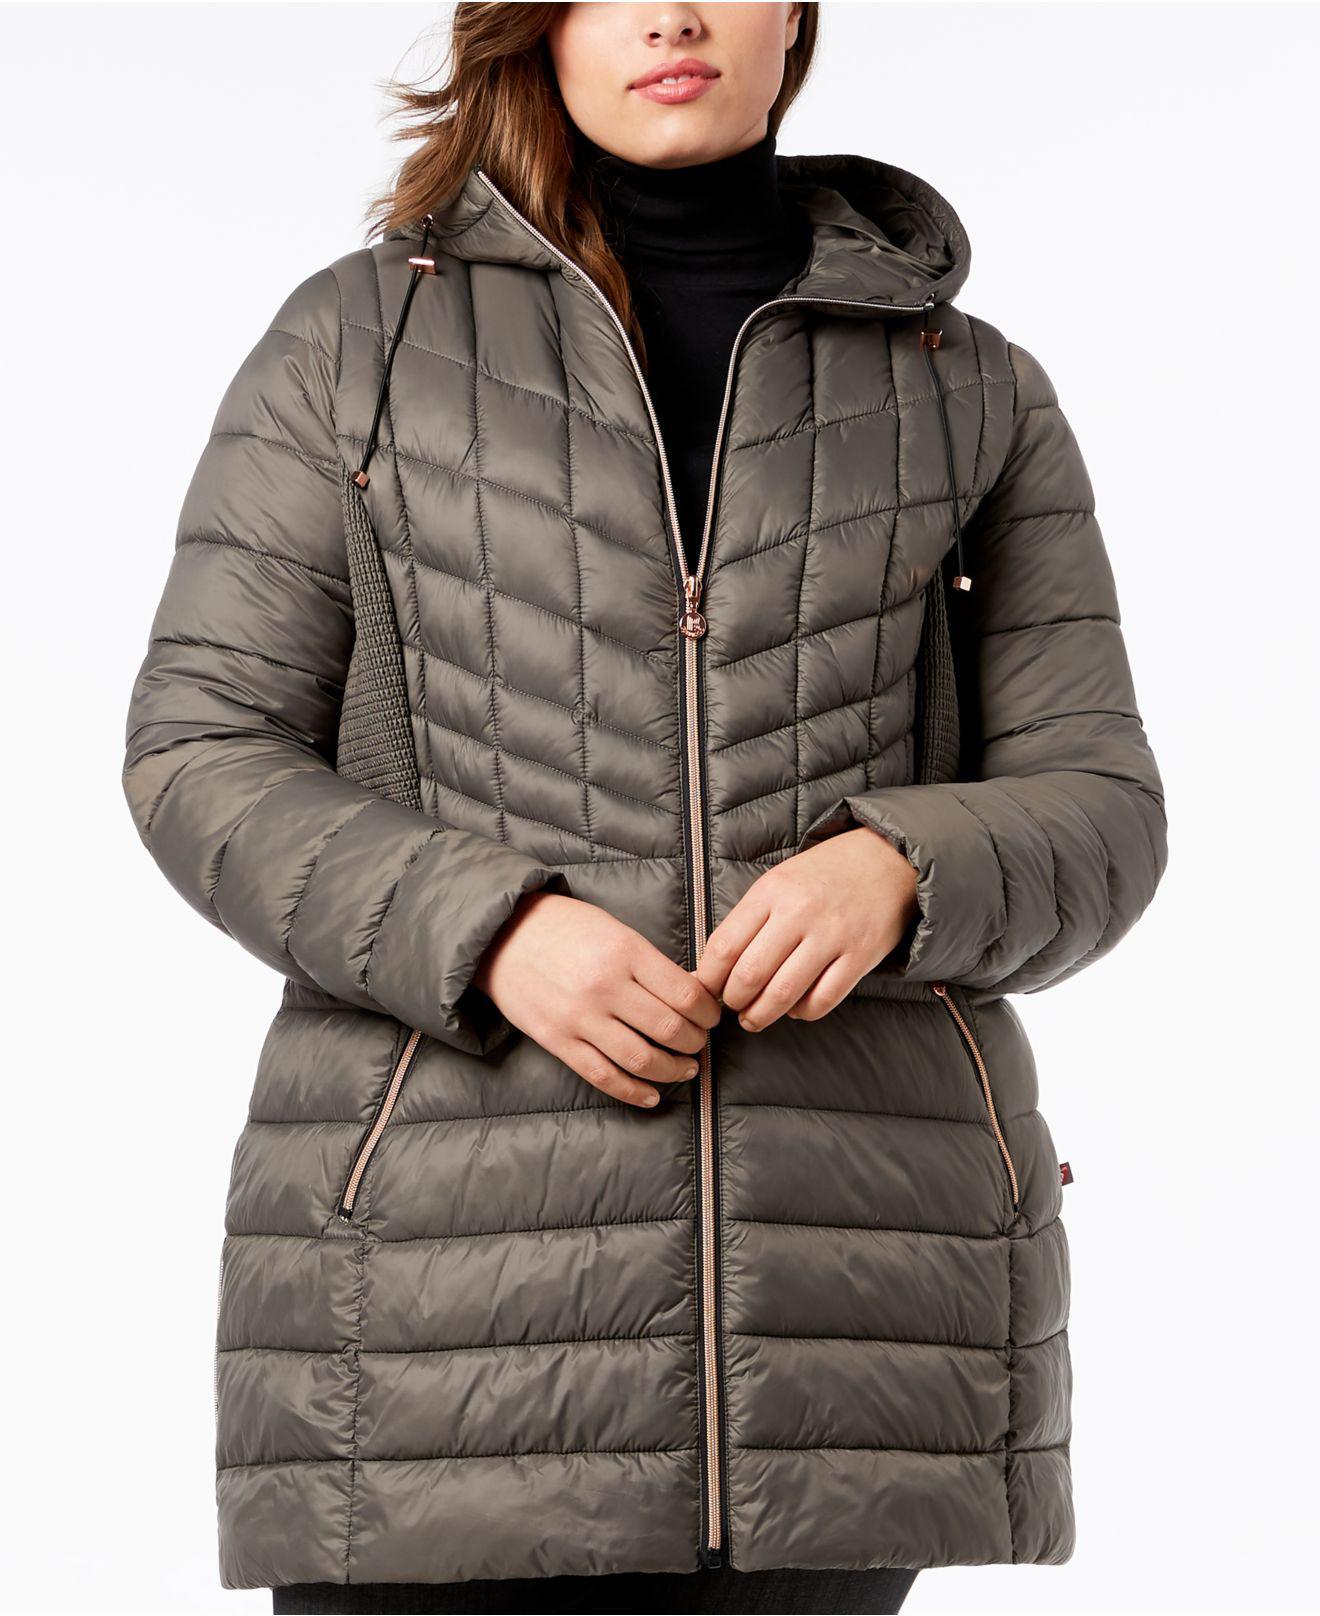 e897303100b Lyst - Bernardo Plus Size Packable Puffer Coat